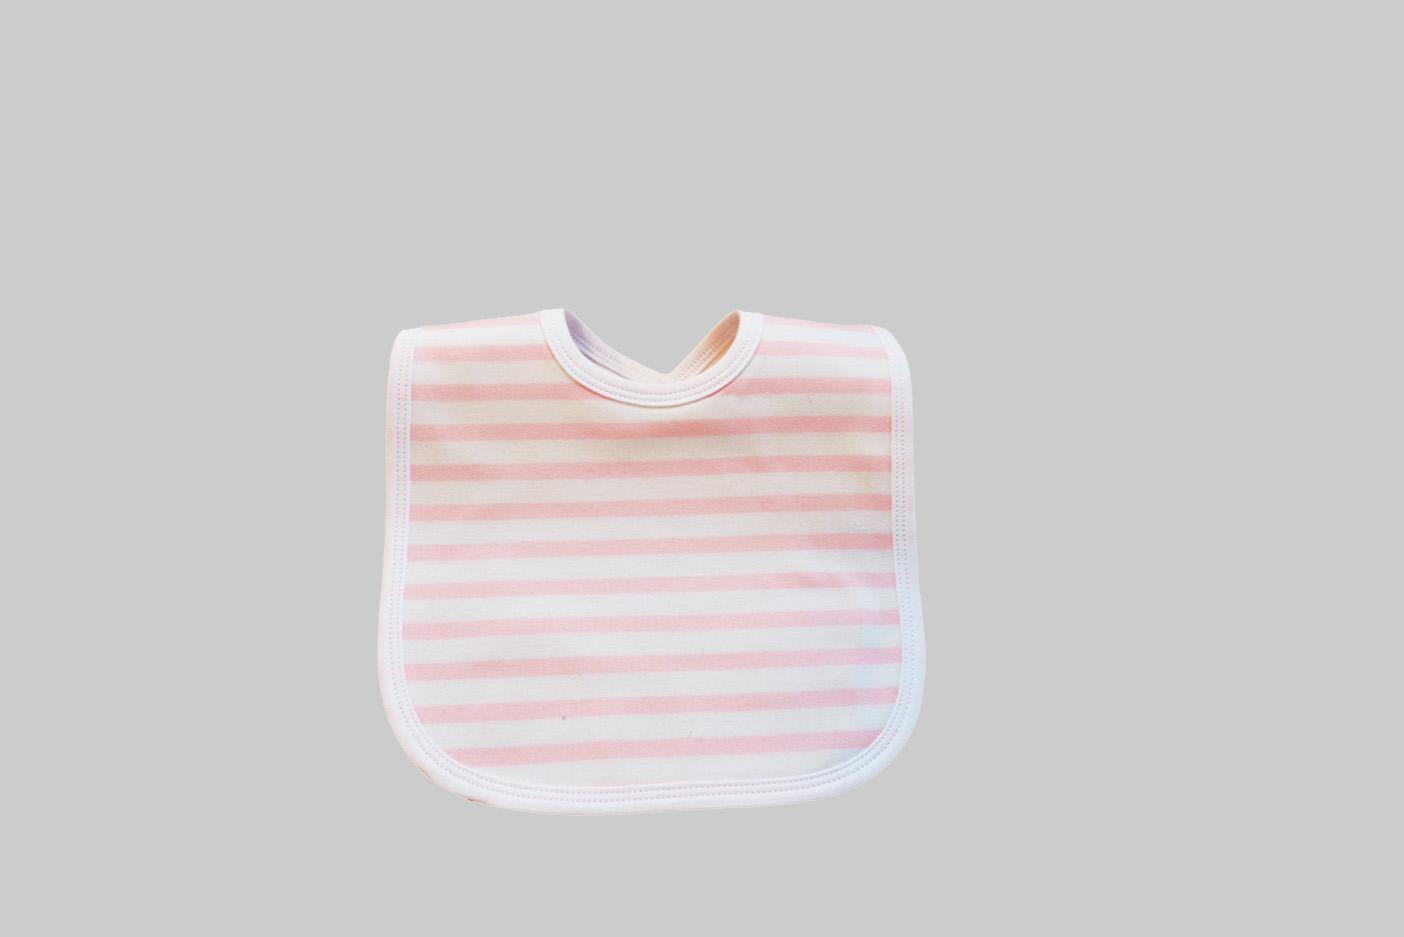 Woven Light Pink Stripes Baby Bib